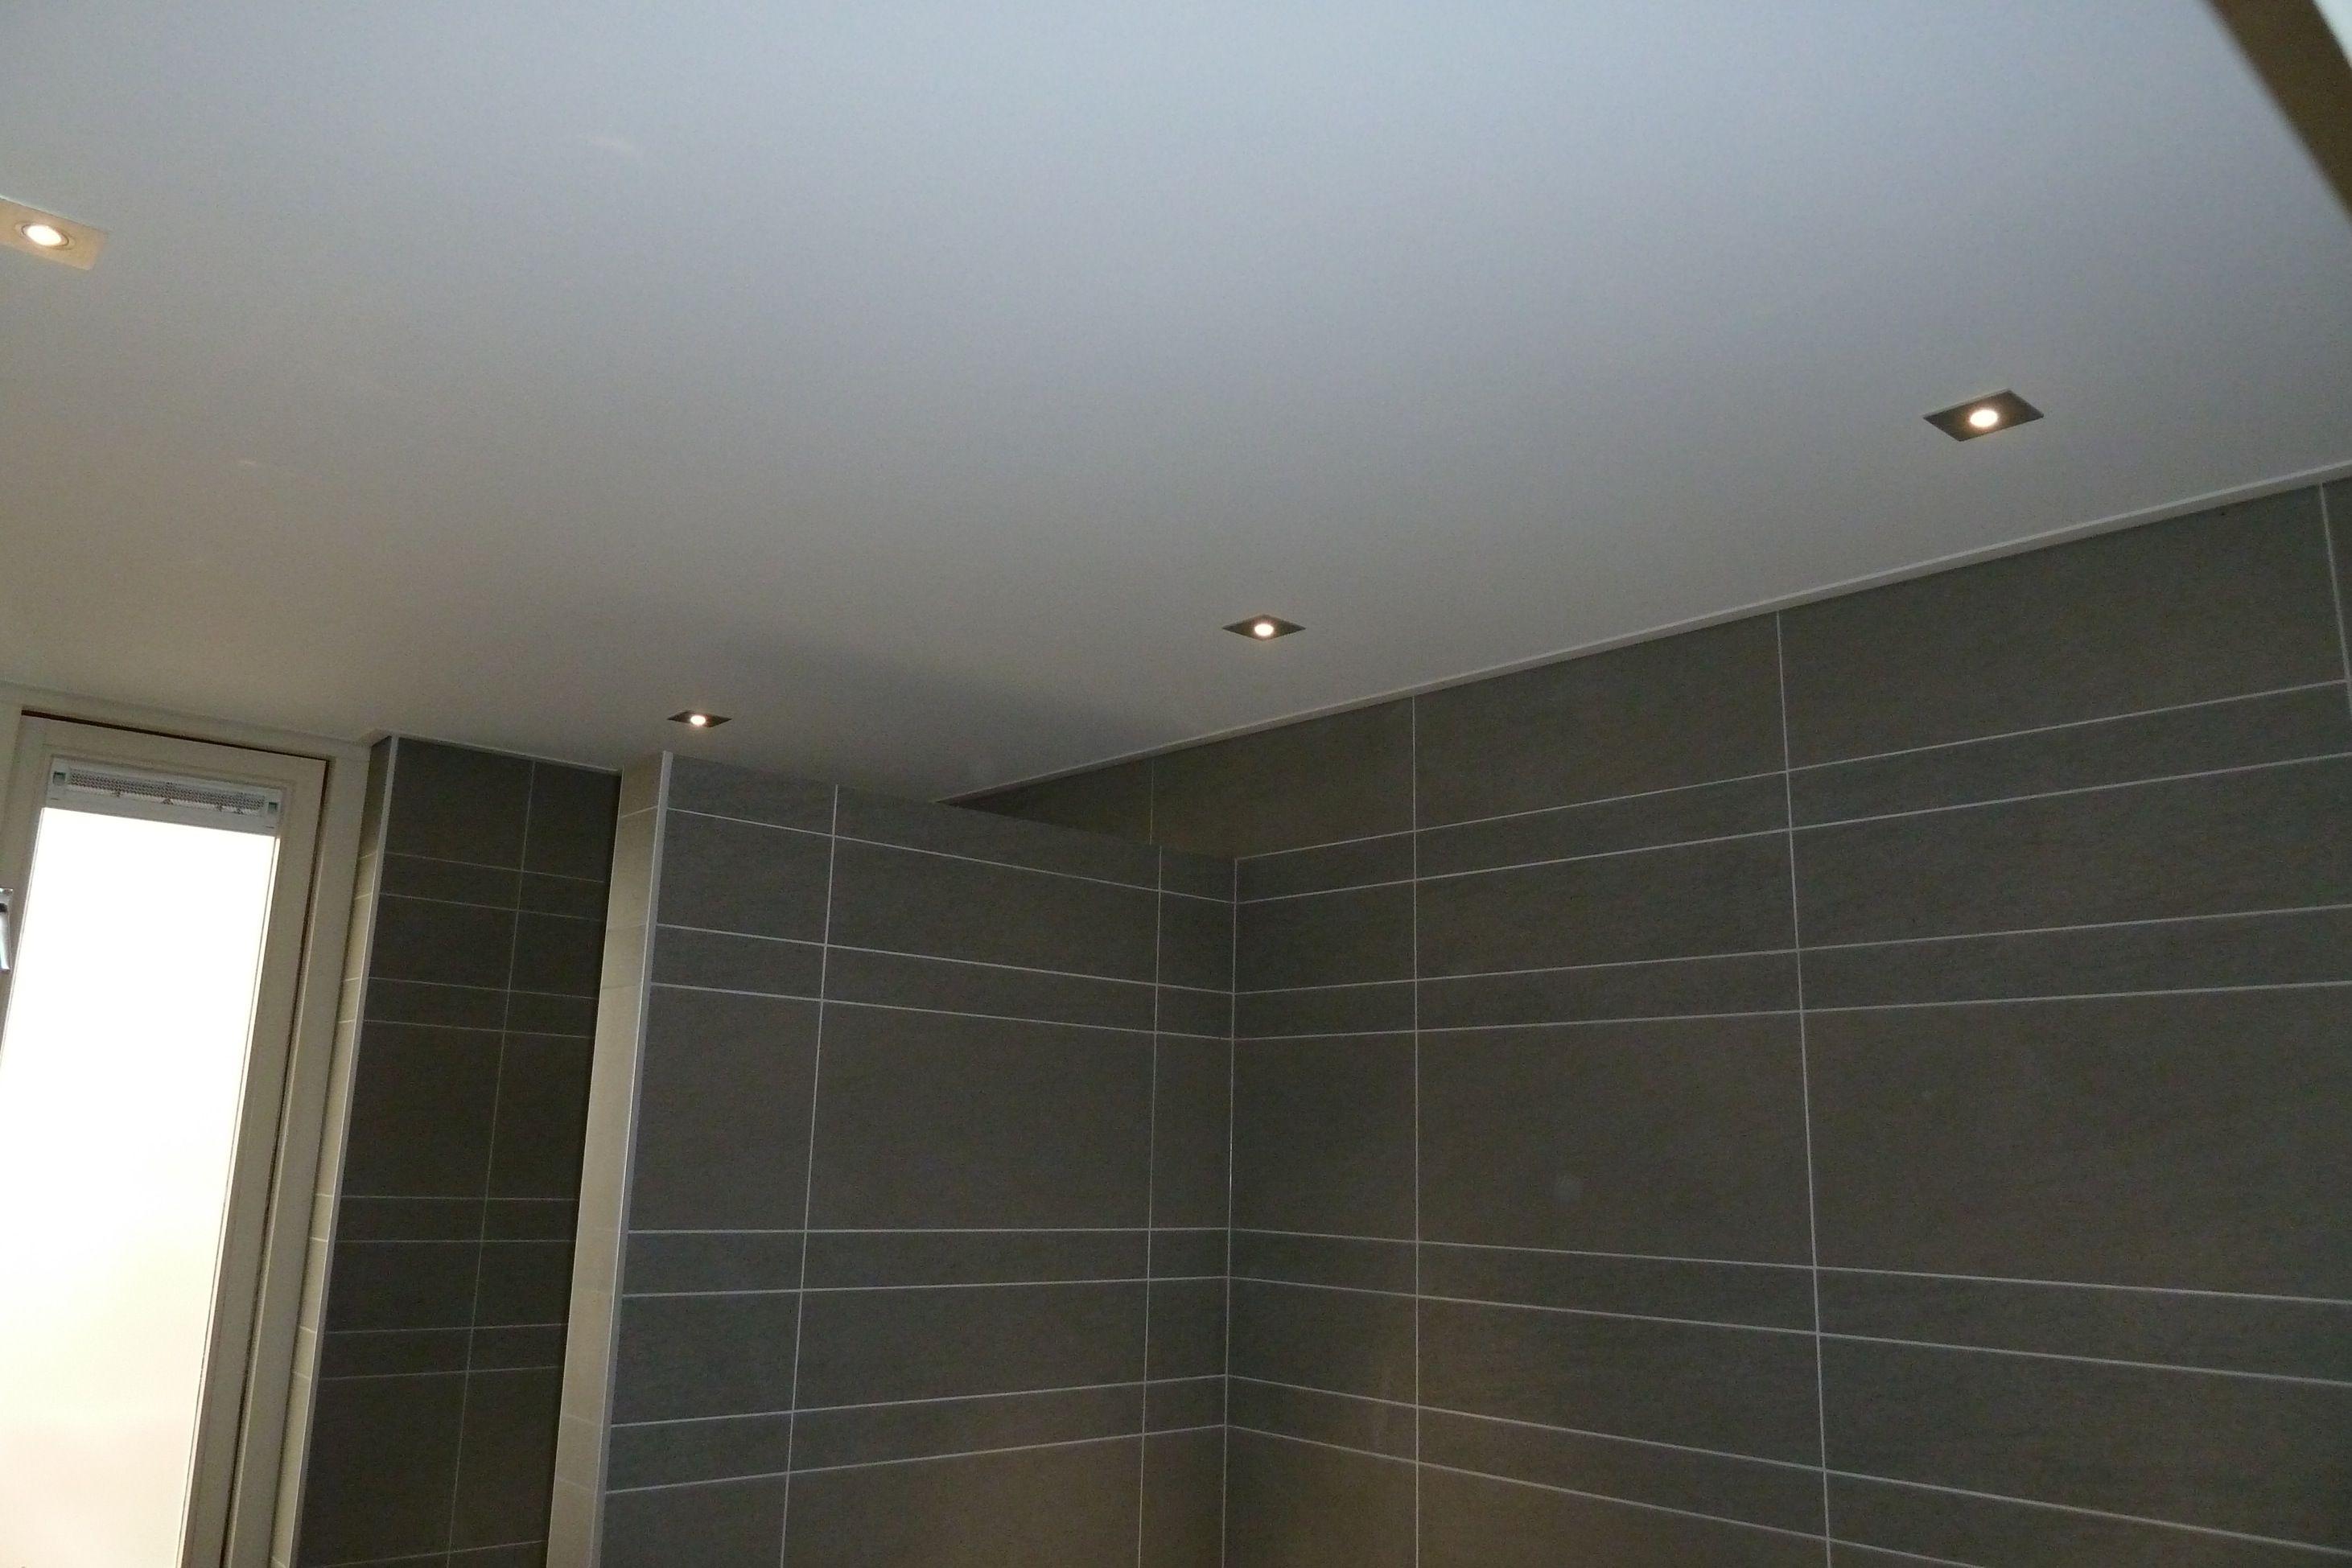 plafond badkamer - Google zoeken   Badkamer   Pinterest   Searching